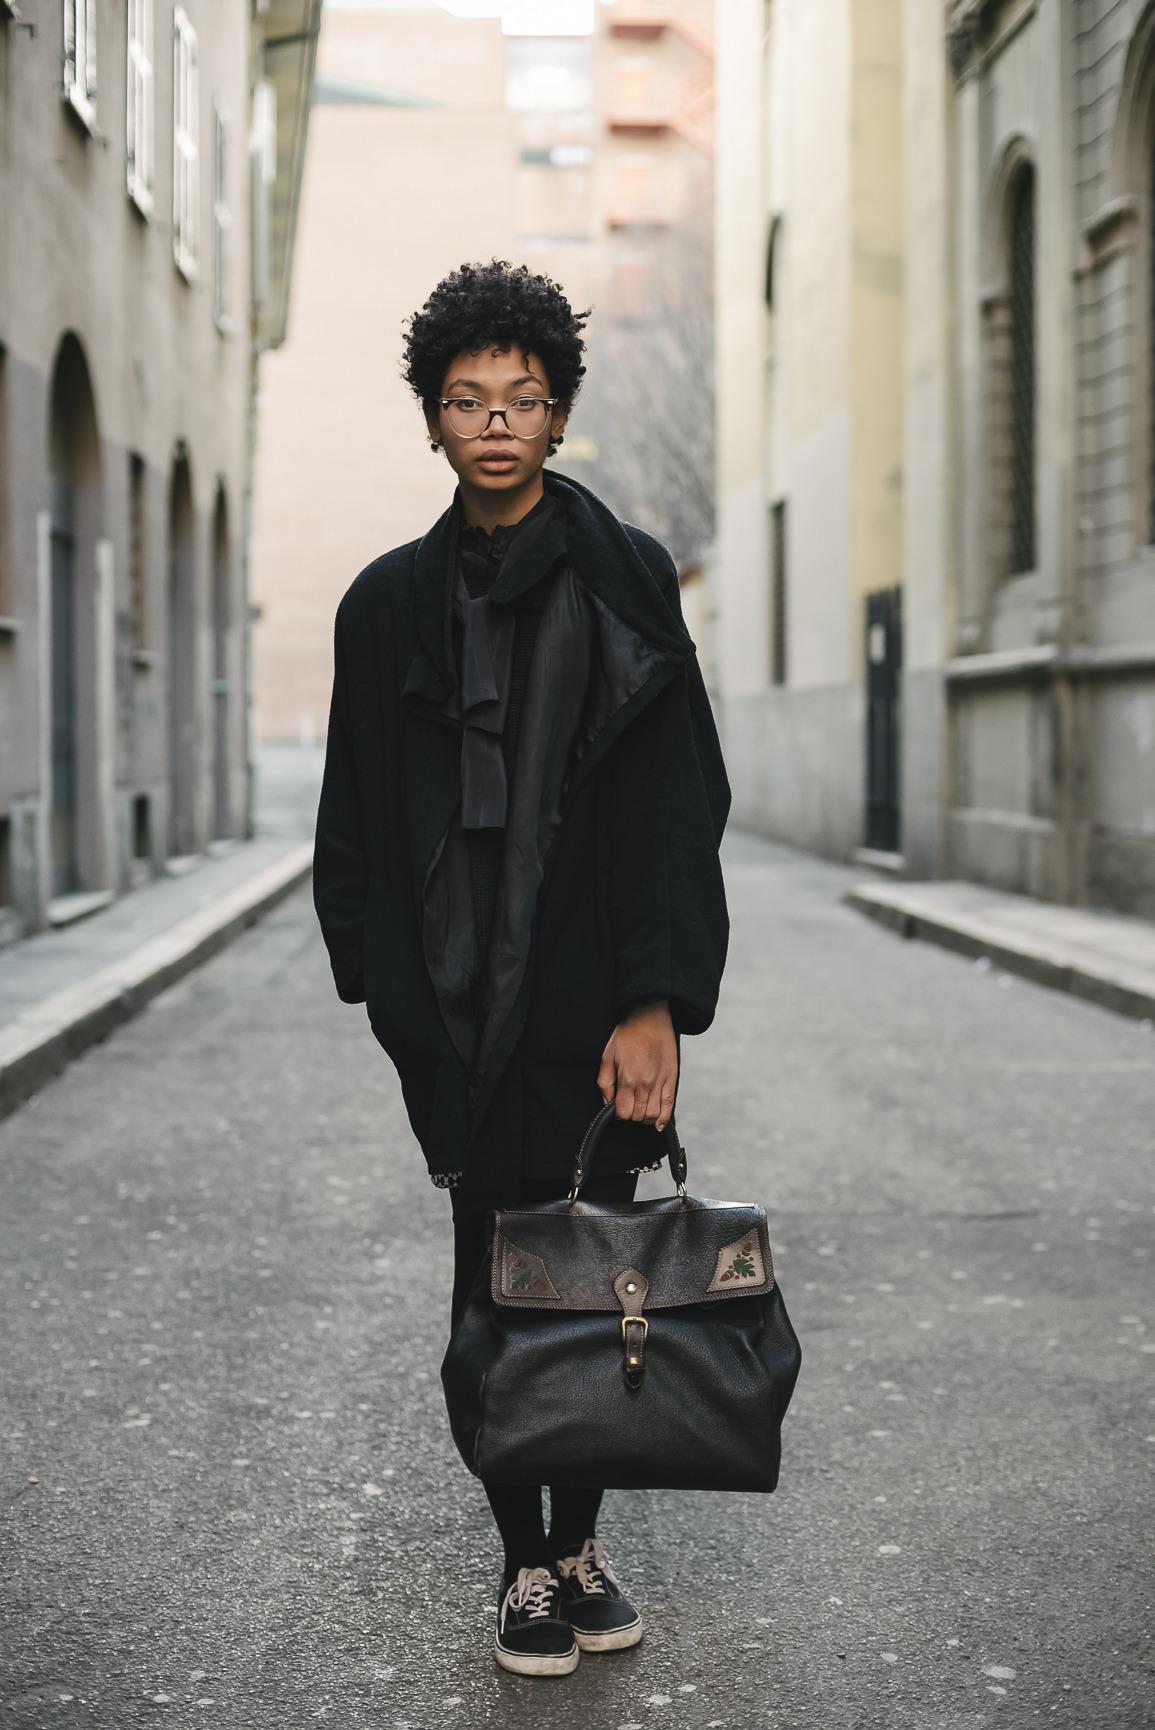 Style Vintage Street Style Model Black Girls Bag Outfit Black